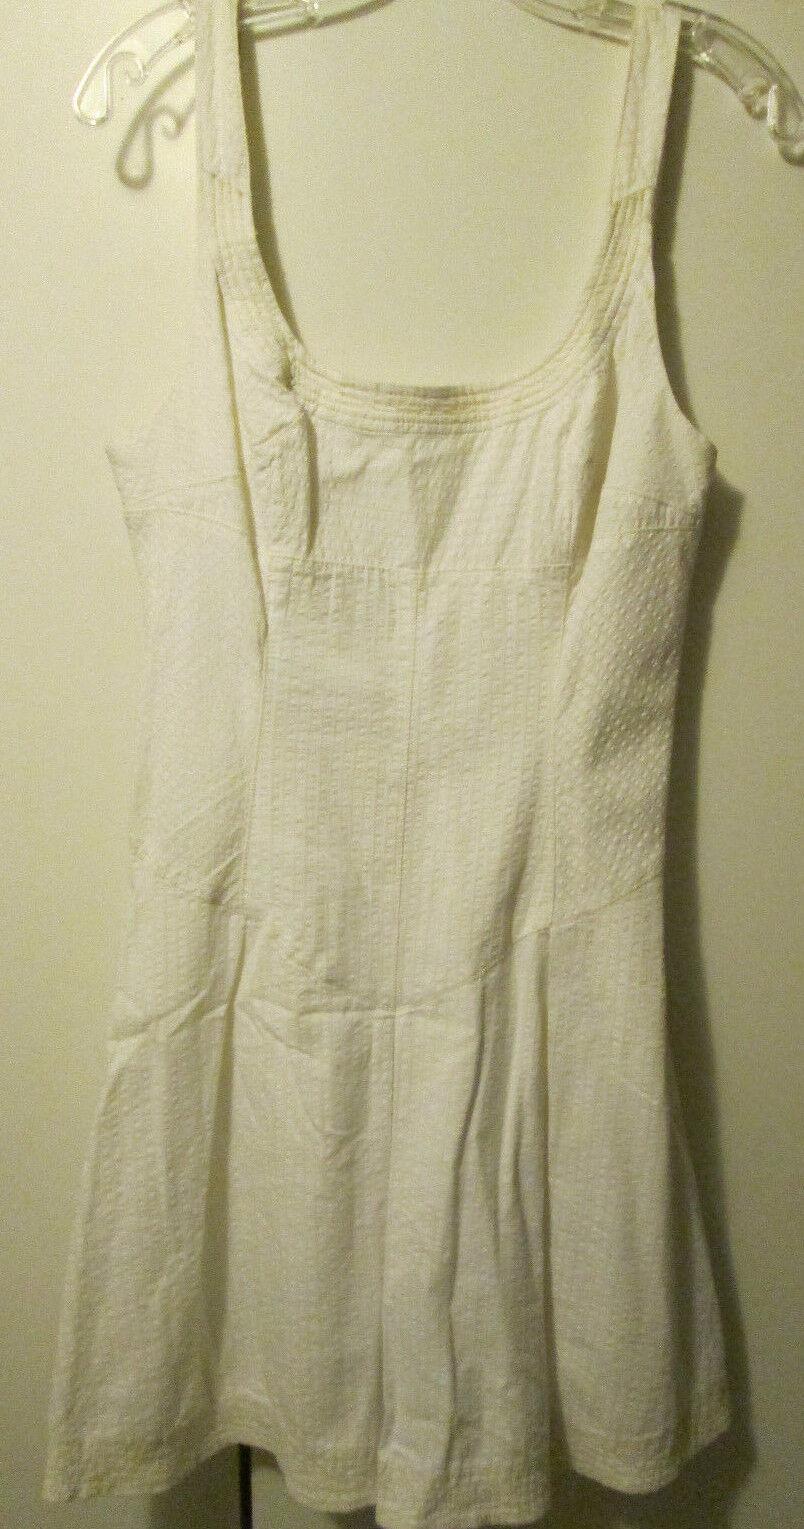 Free People Weiß Gelb Stitch Striped Mini Dress Sundress Größe 10 M NWT